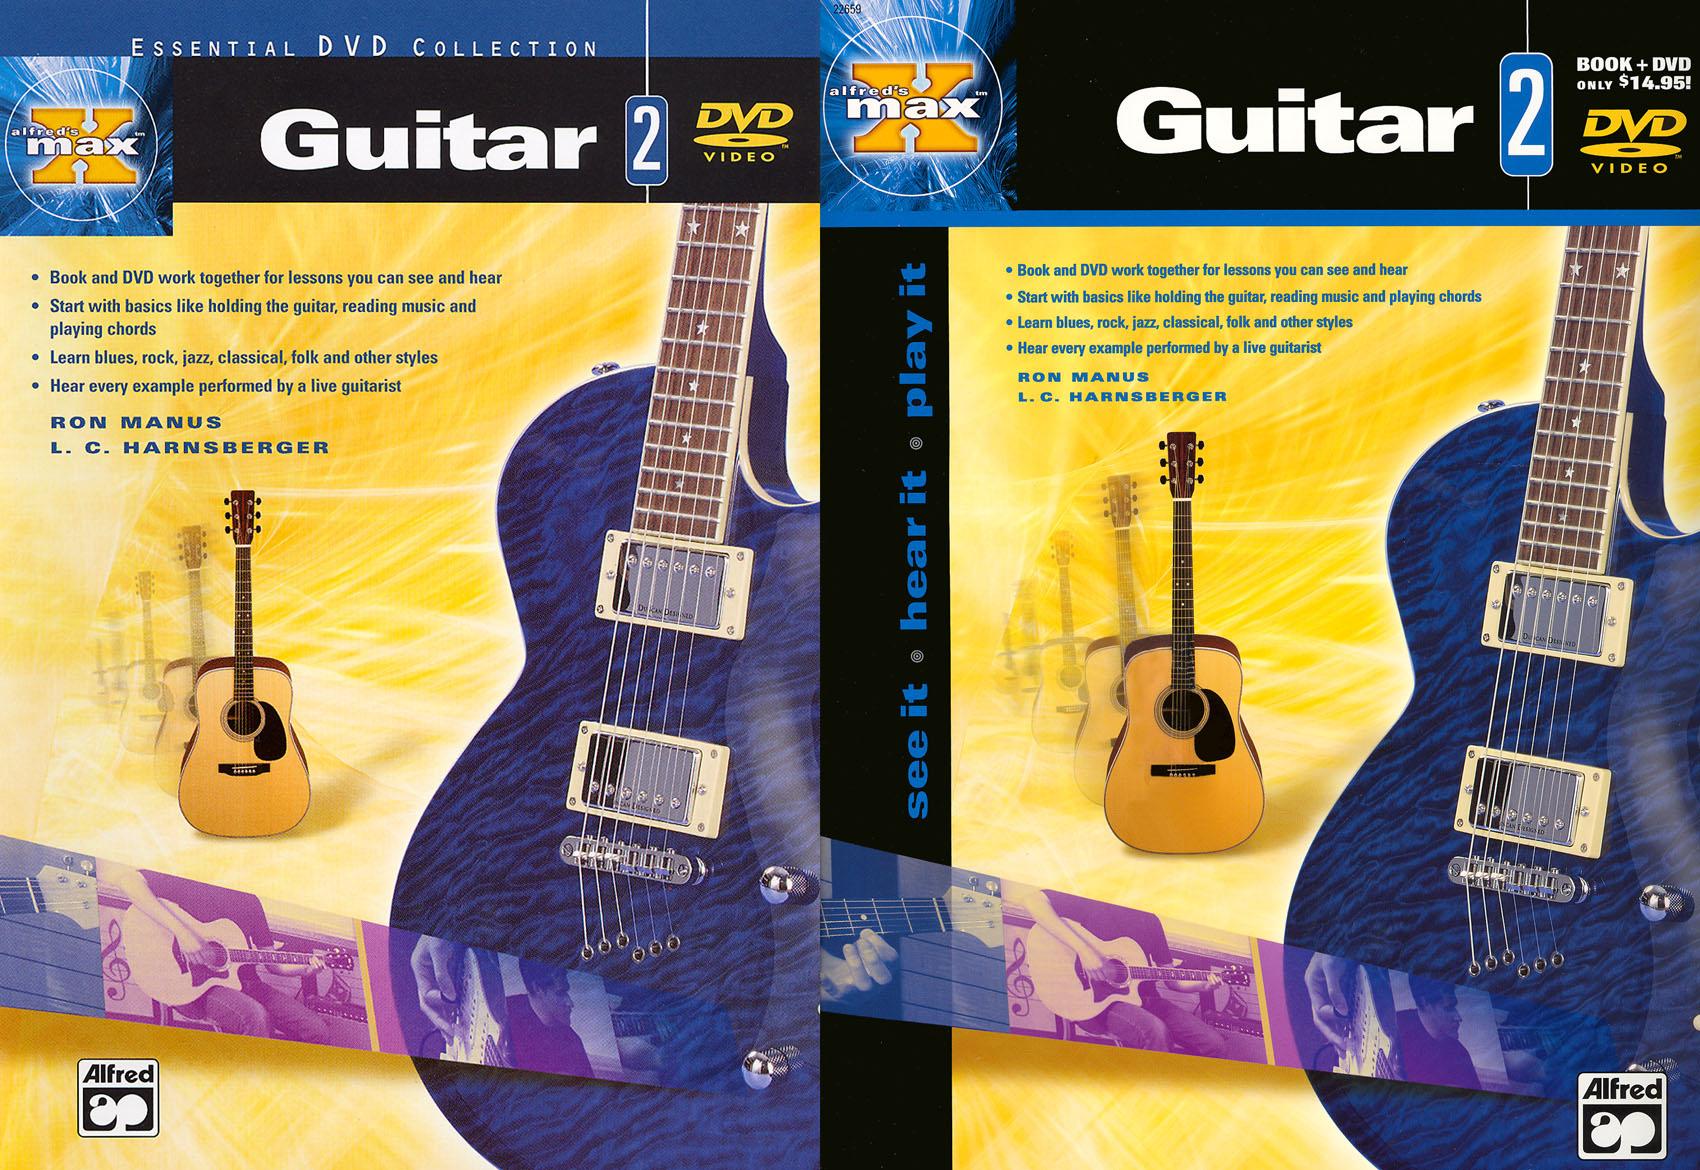 Alfred's Max Guitar, Vol. 2